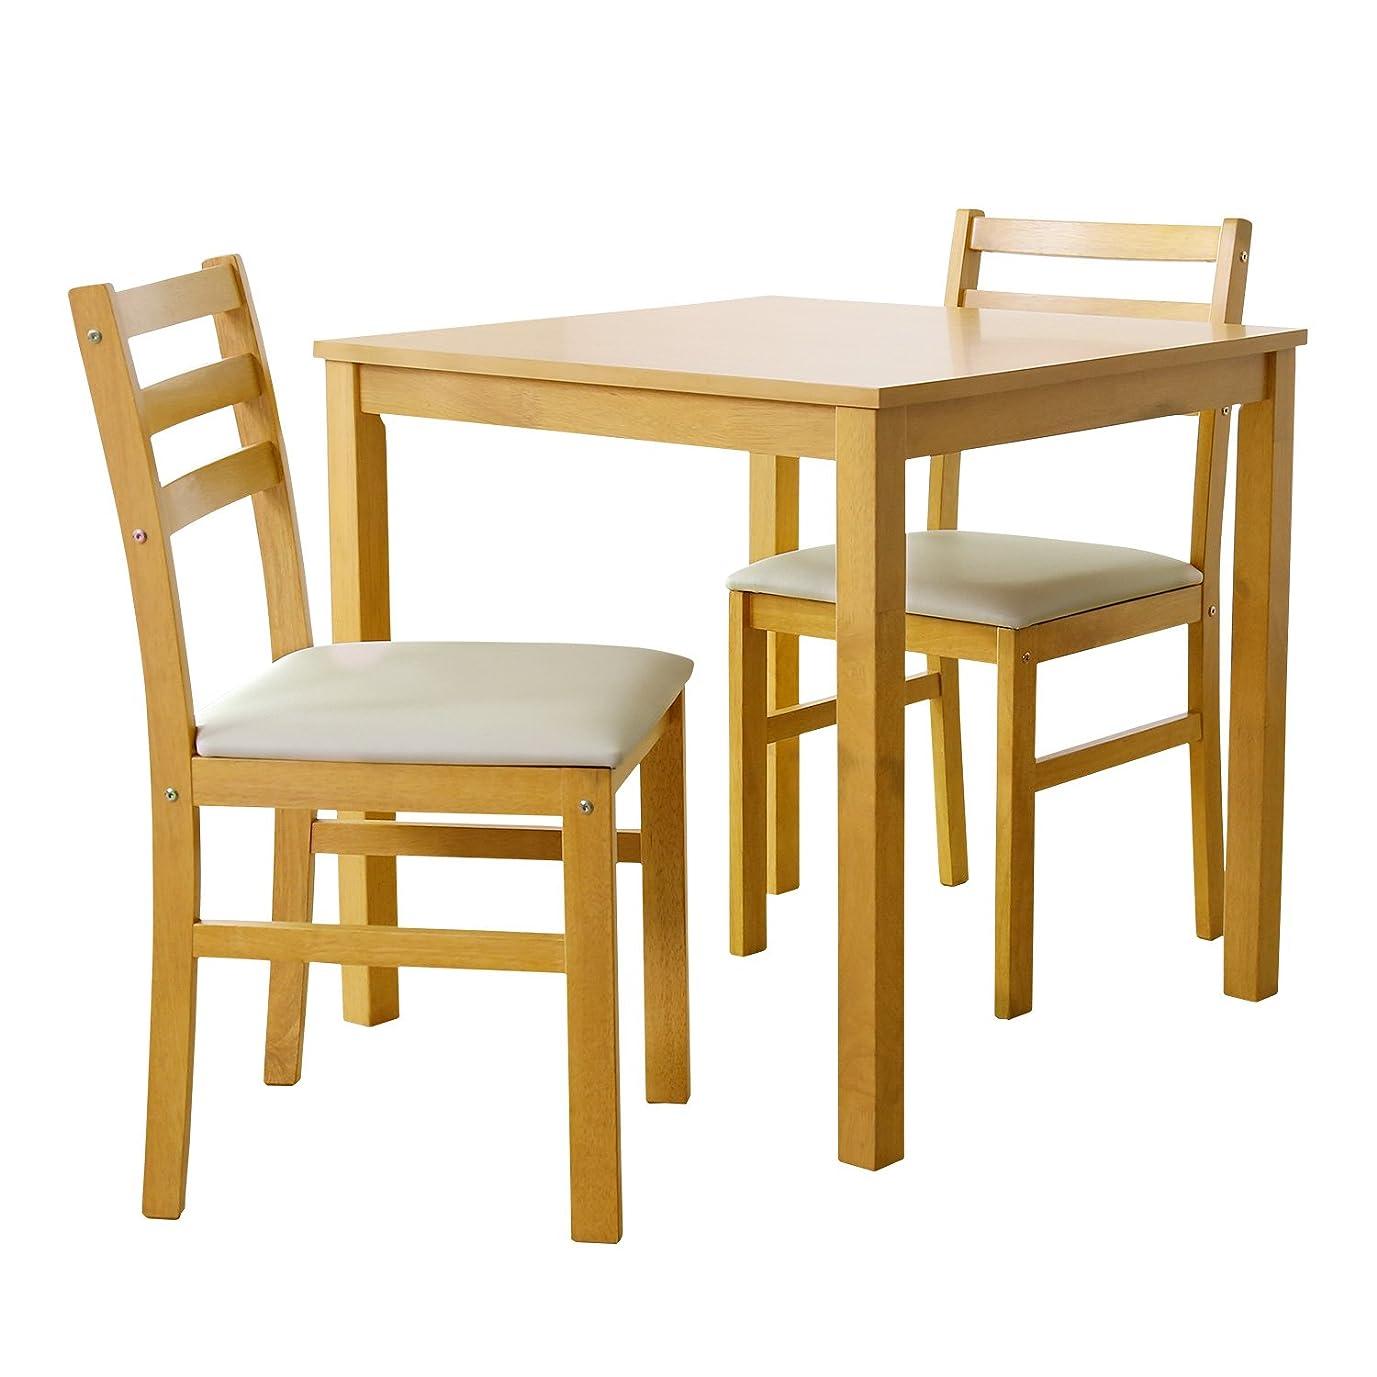 DORIS ダイニングテーブル 2人用 ダイニングテーブルセット 3点セット 75cm幅 天然木 レザー座面 ナチュラル アンドリア